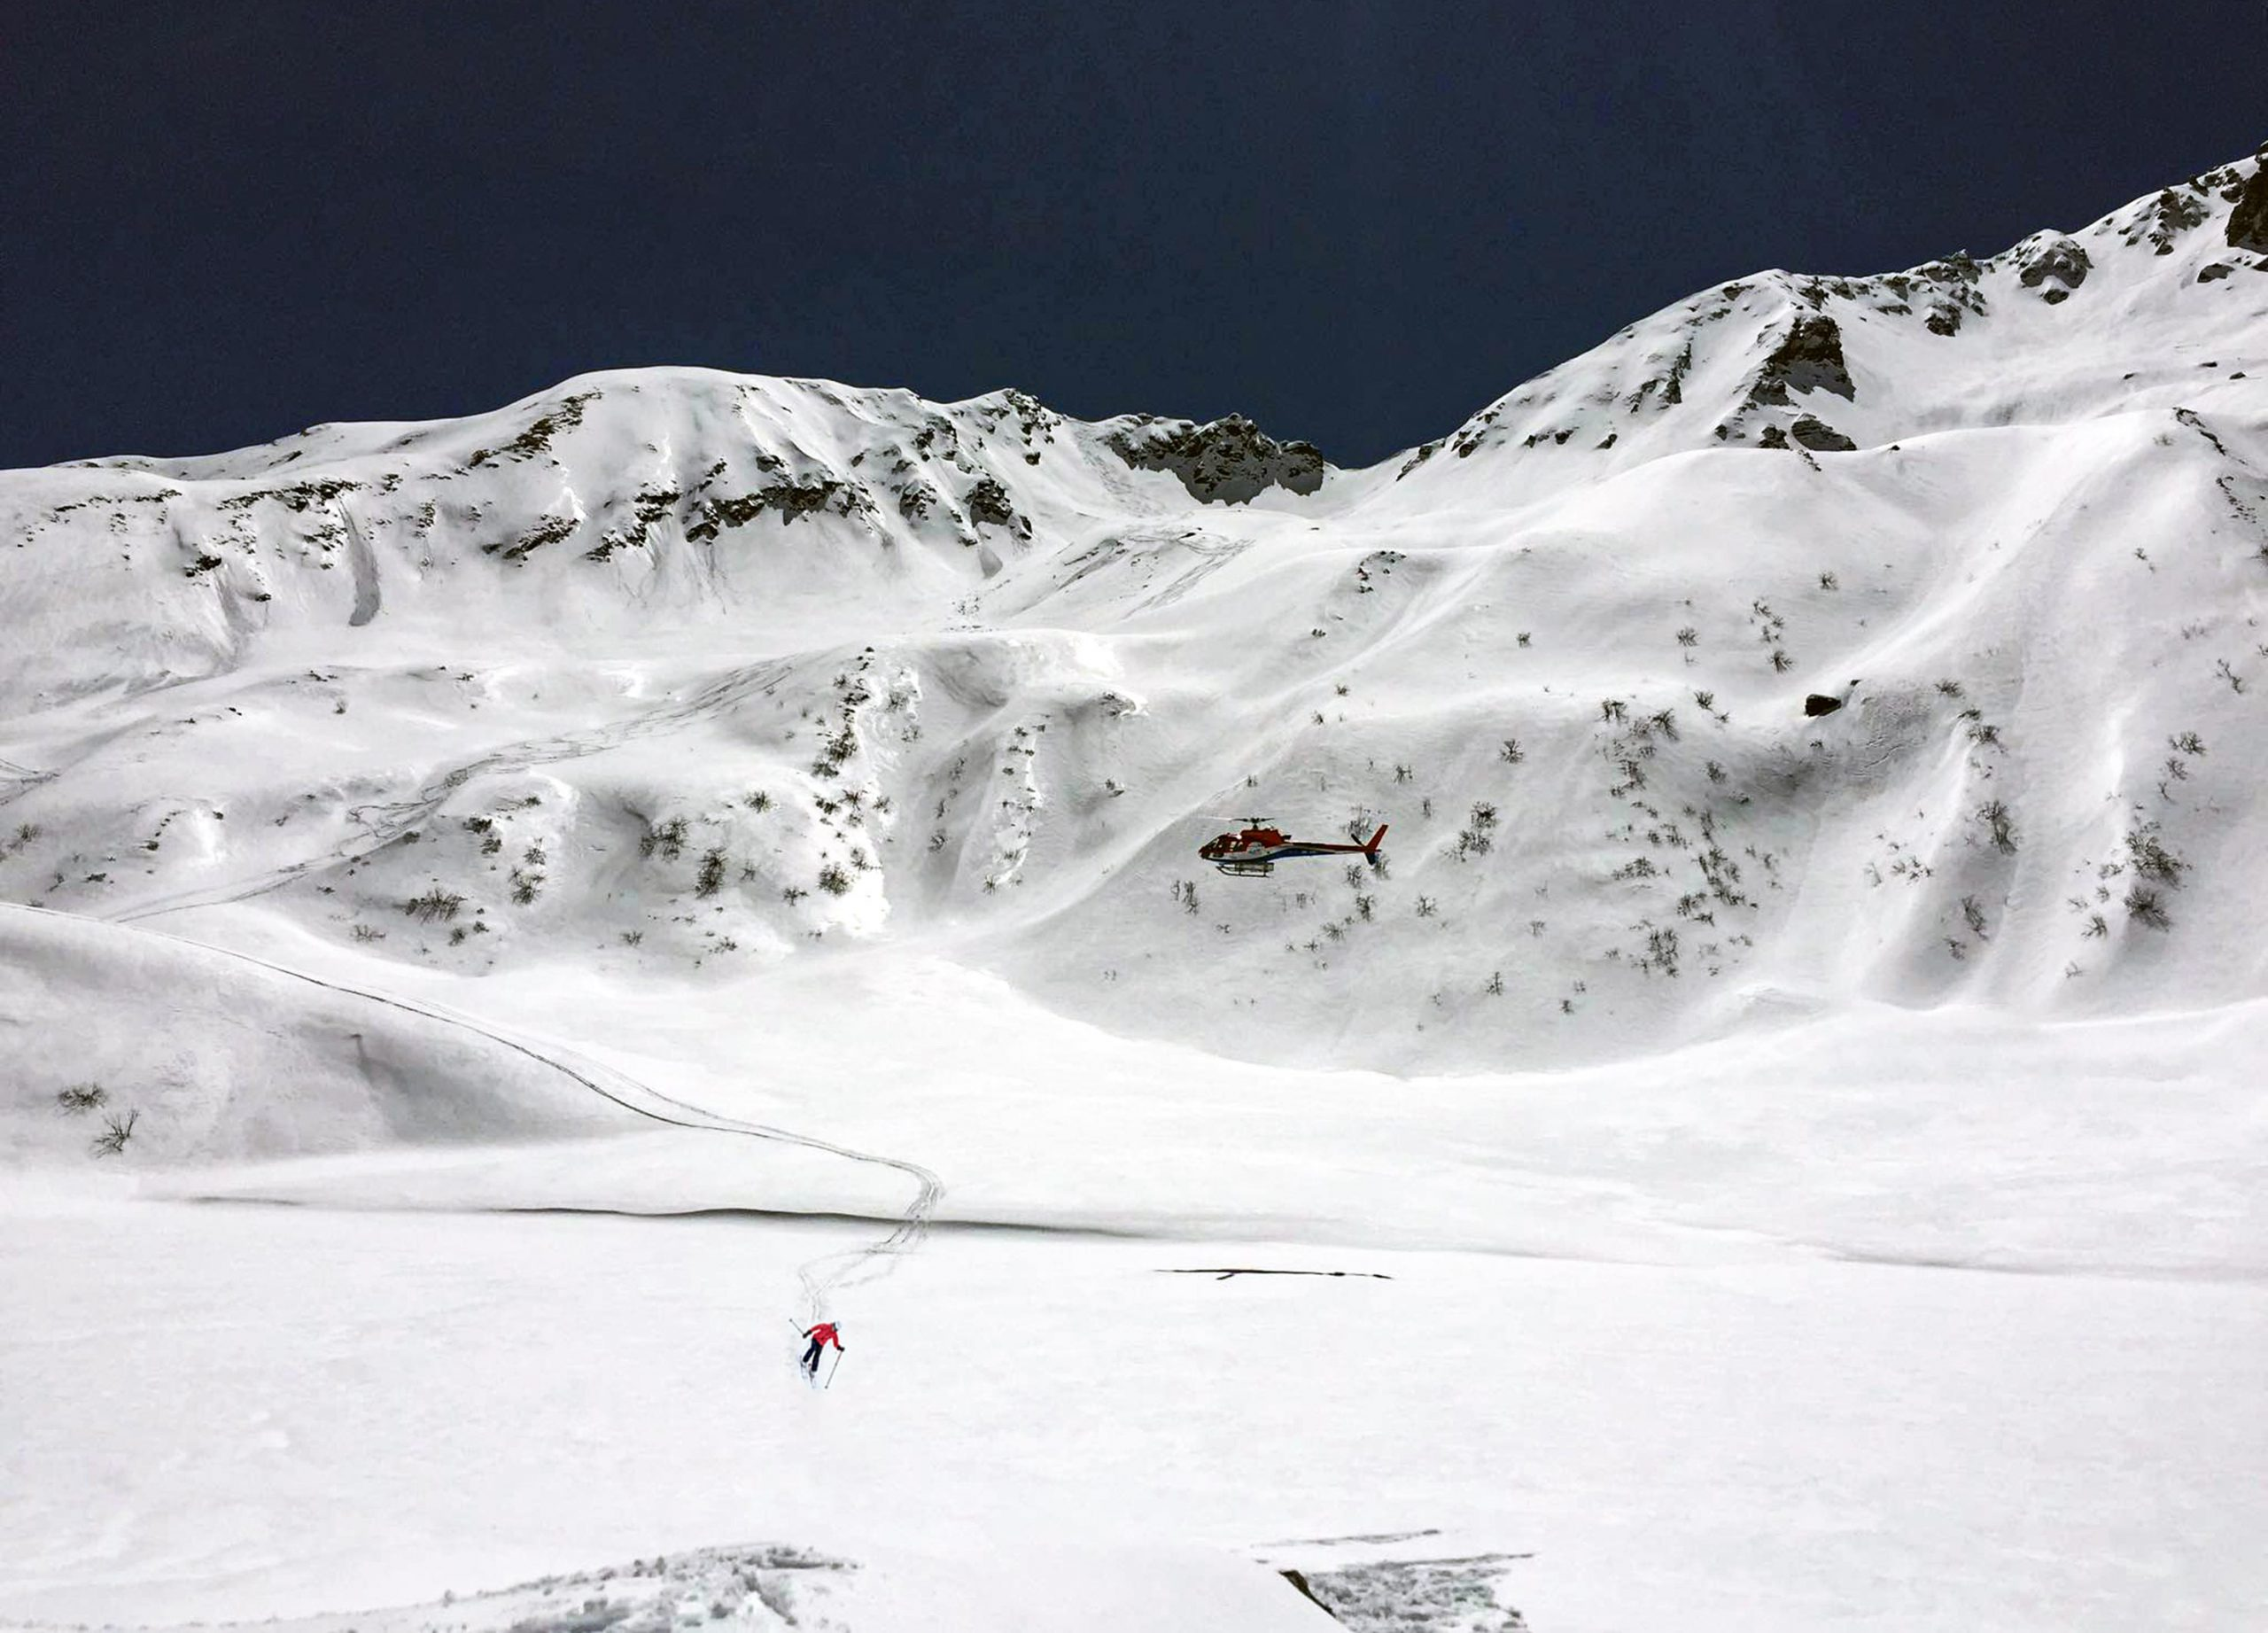 heli skiing in nepal